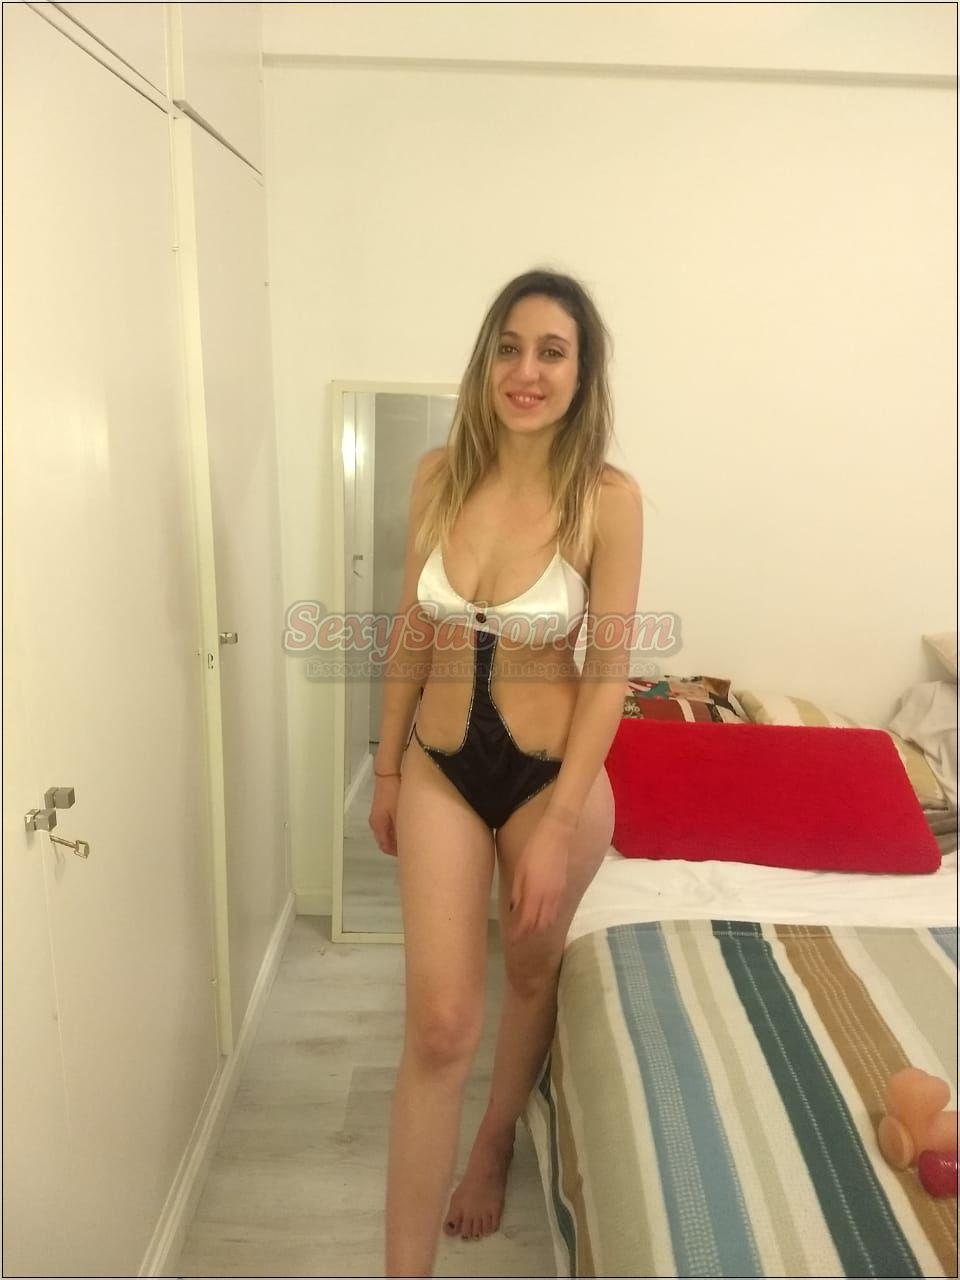 Lynda 15-2749-5592